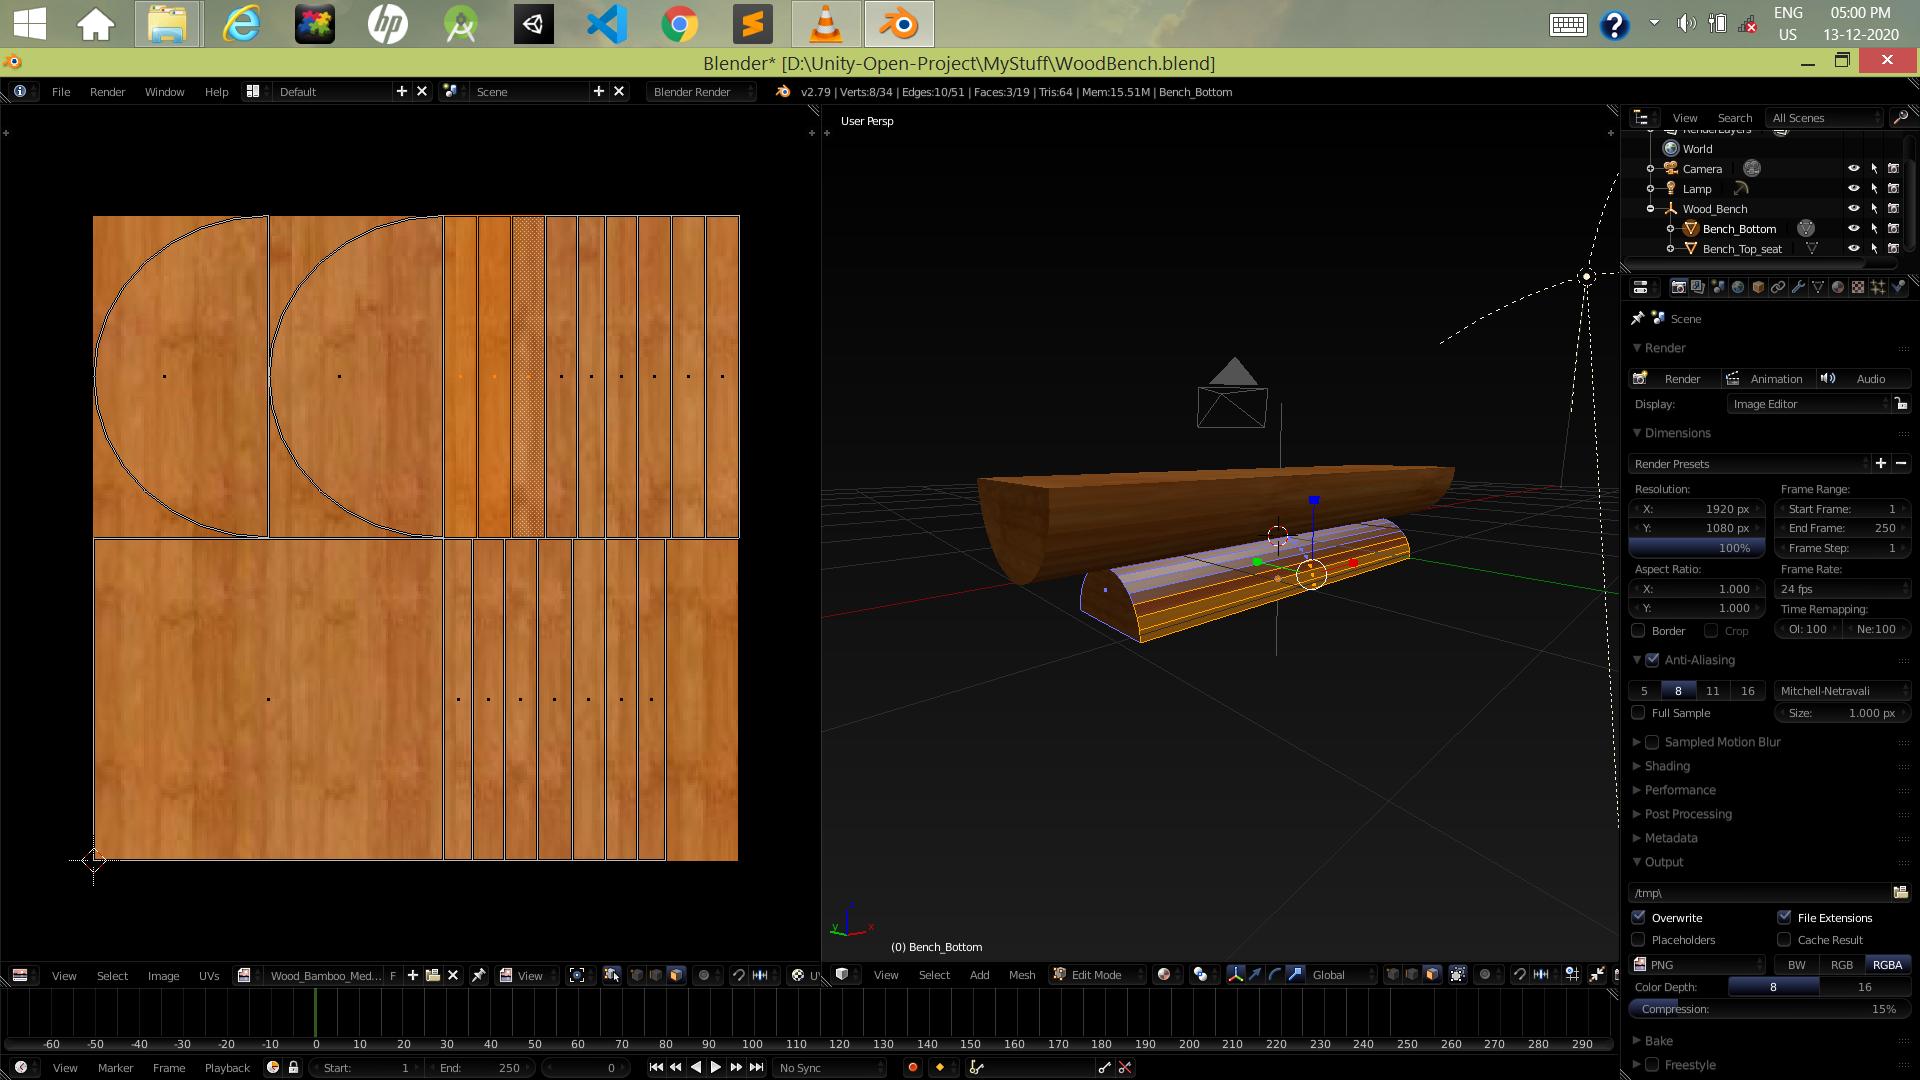 Wood_bench_bottom_UV_Layout.png